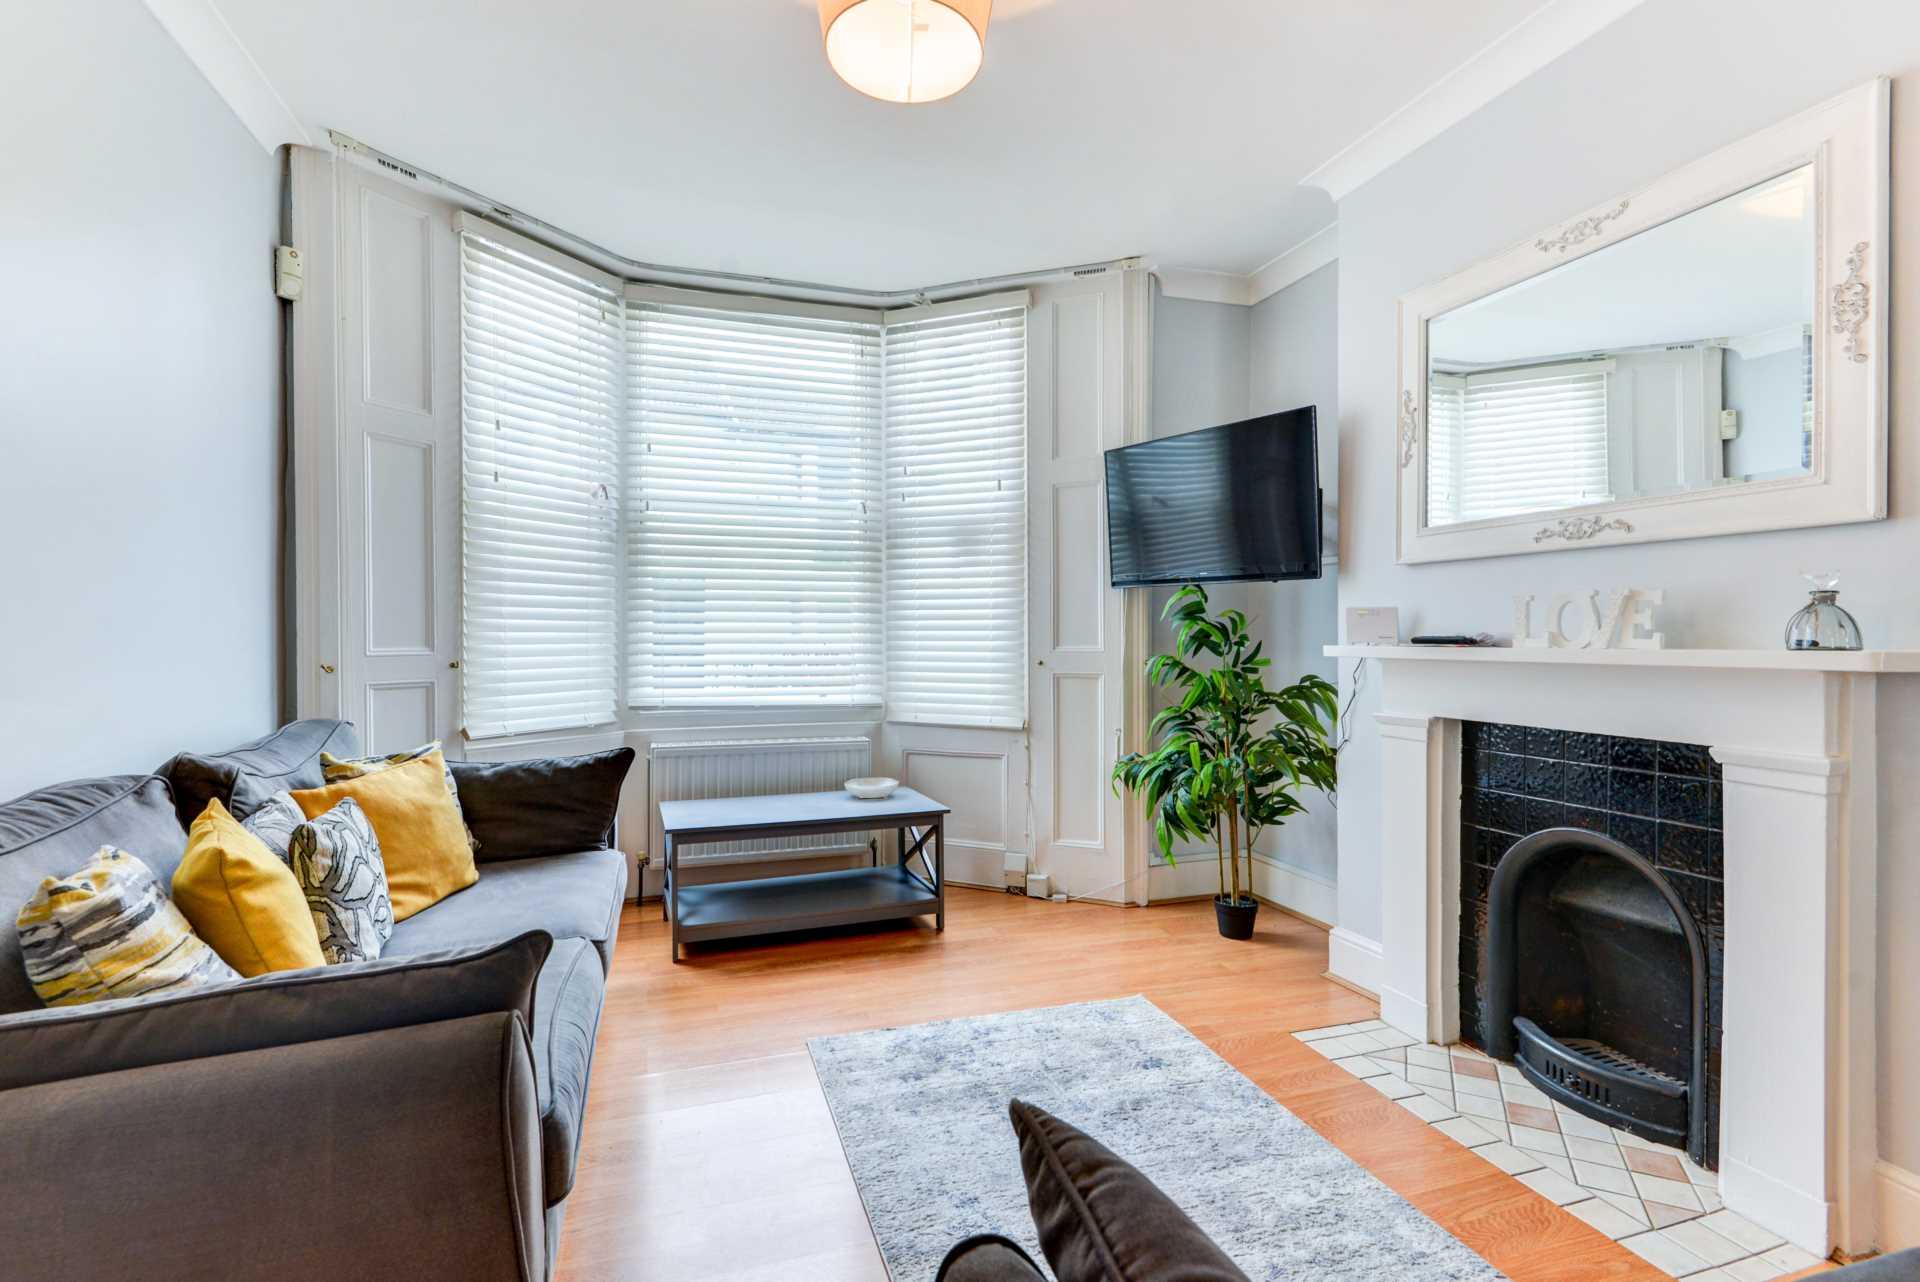 Brighton Central Elegant Home, Image 1